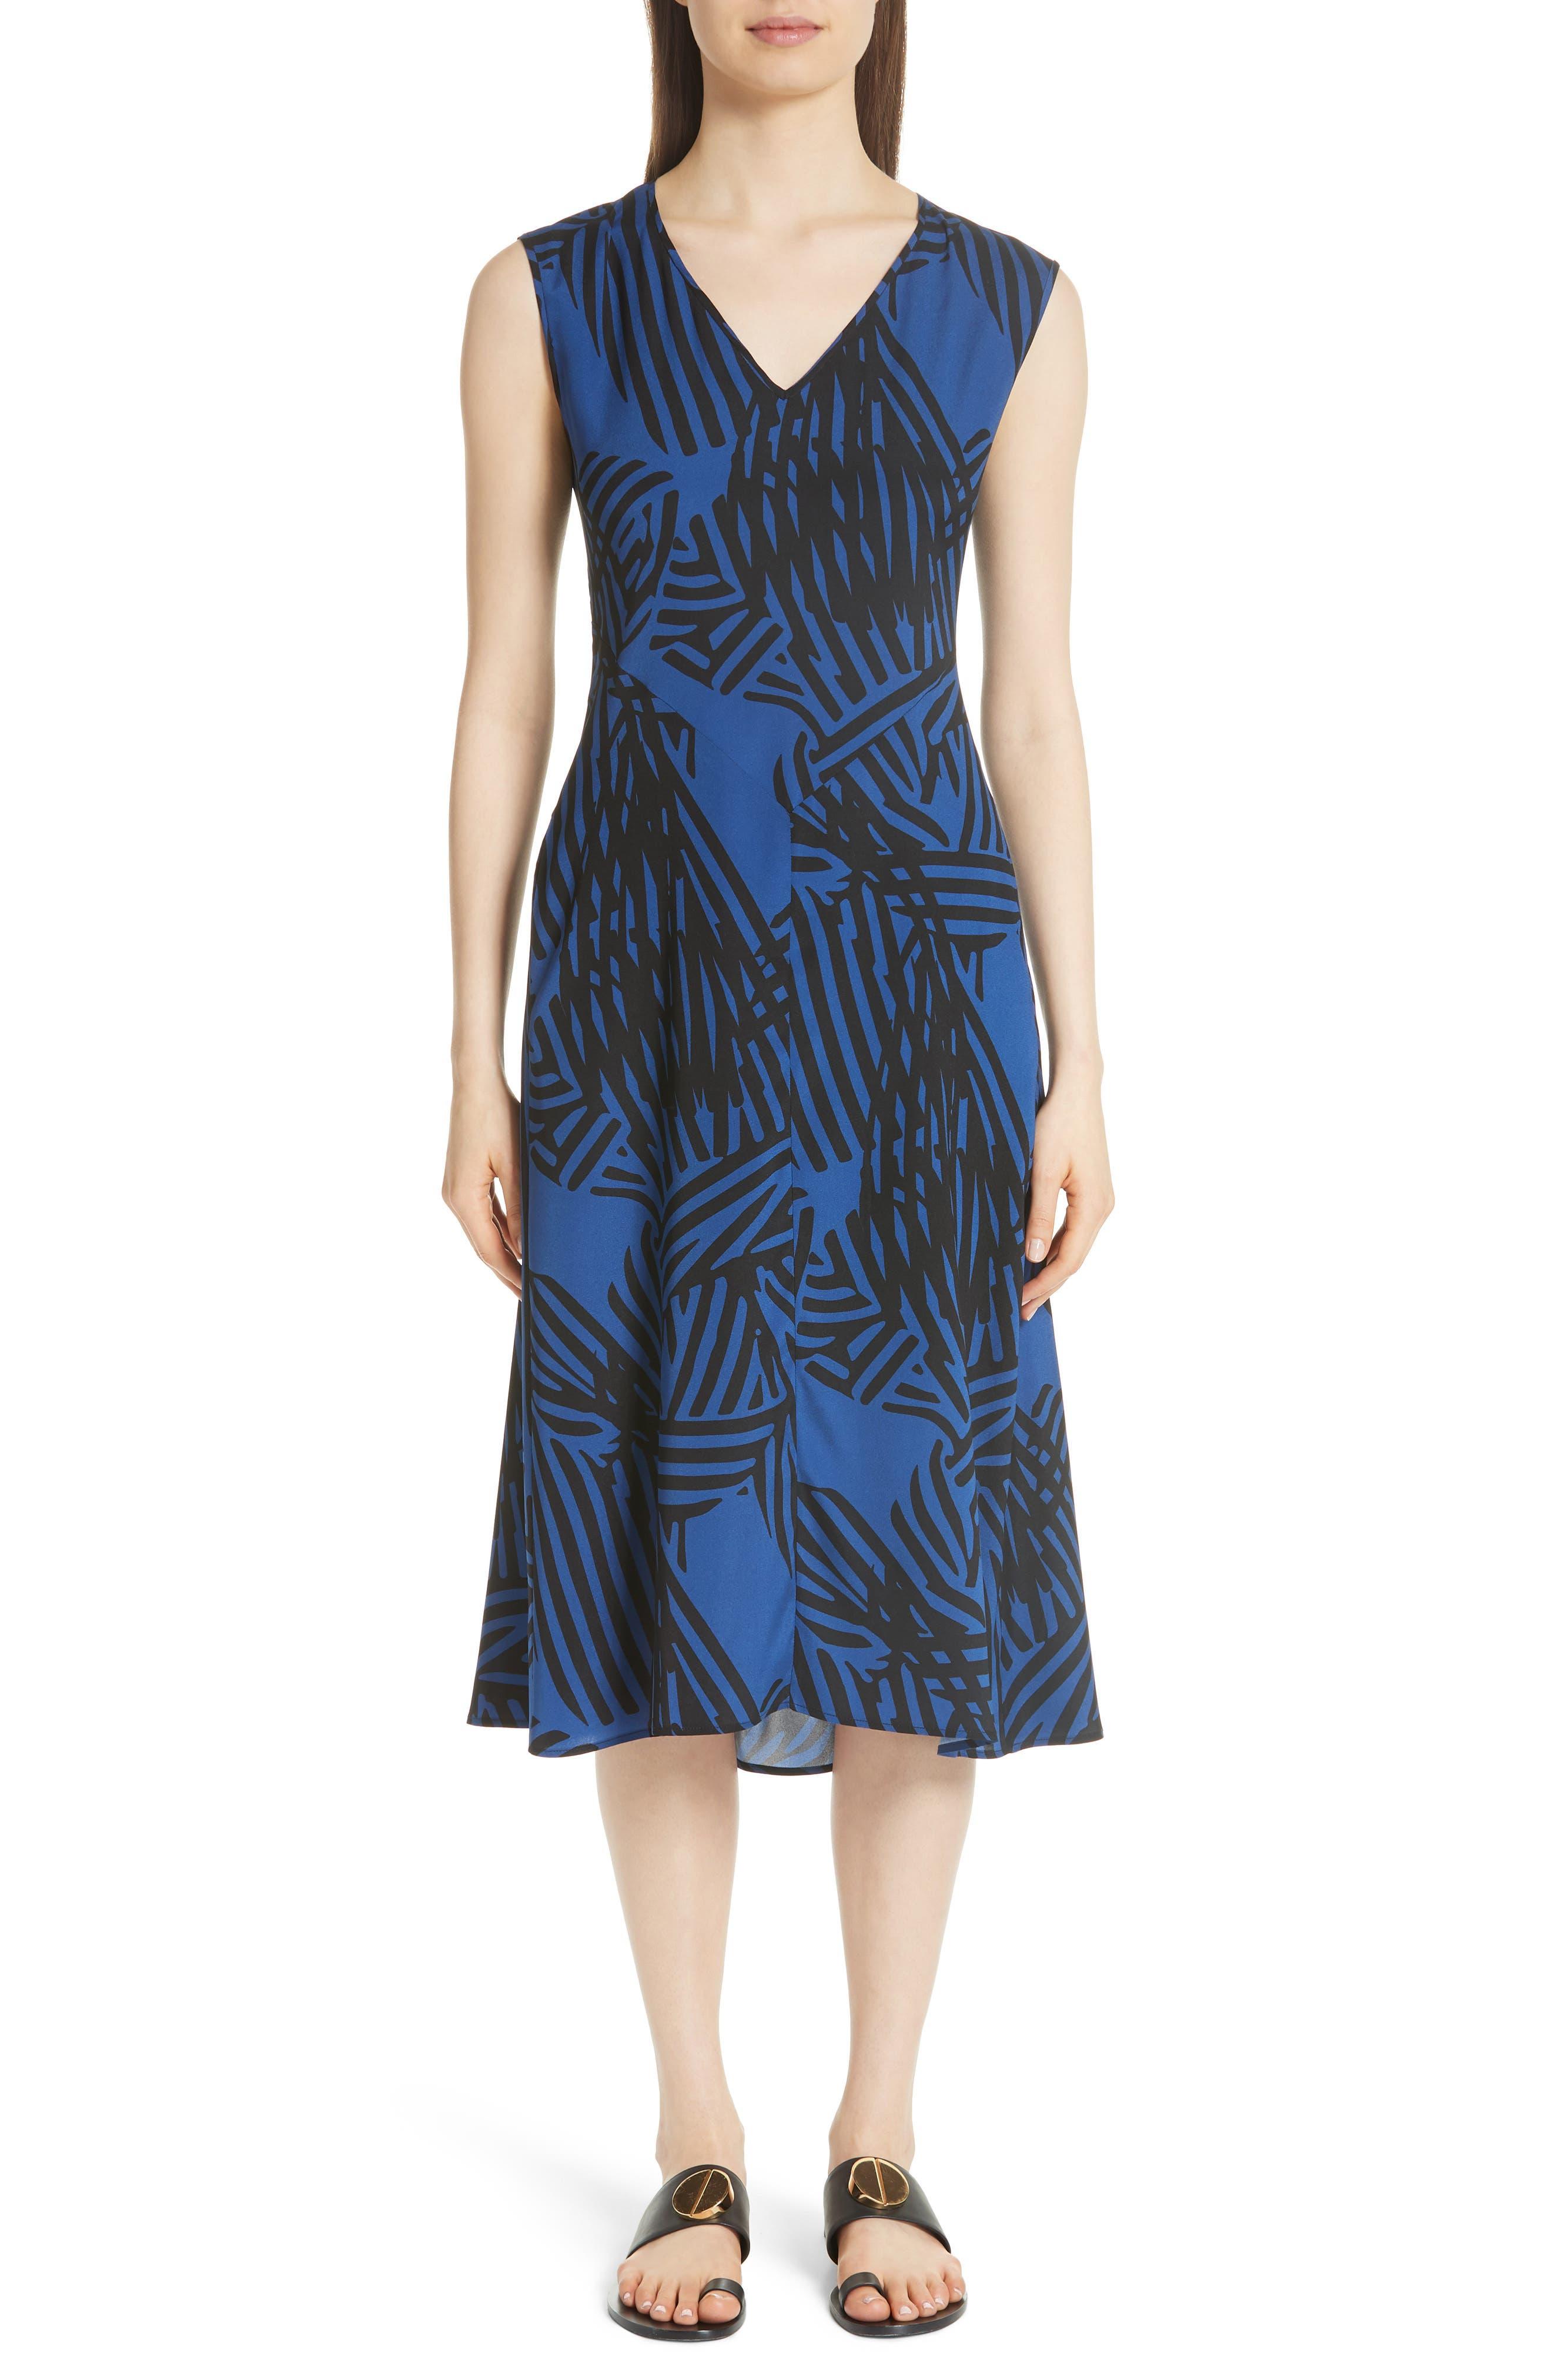 Alternate Image 1 Selected - Zero + Maria Cornejo Ribbon Print Stretch Silk Dress